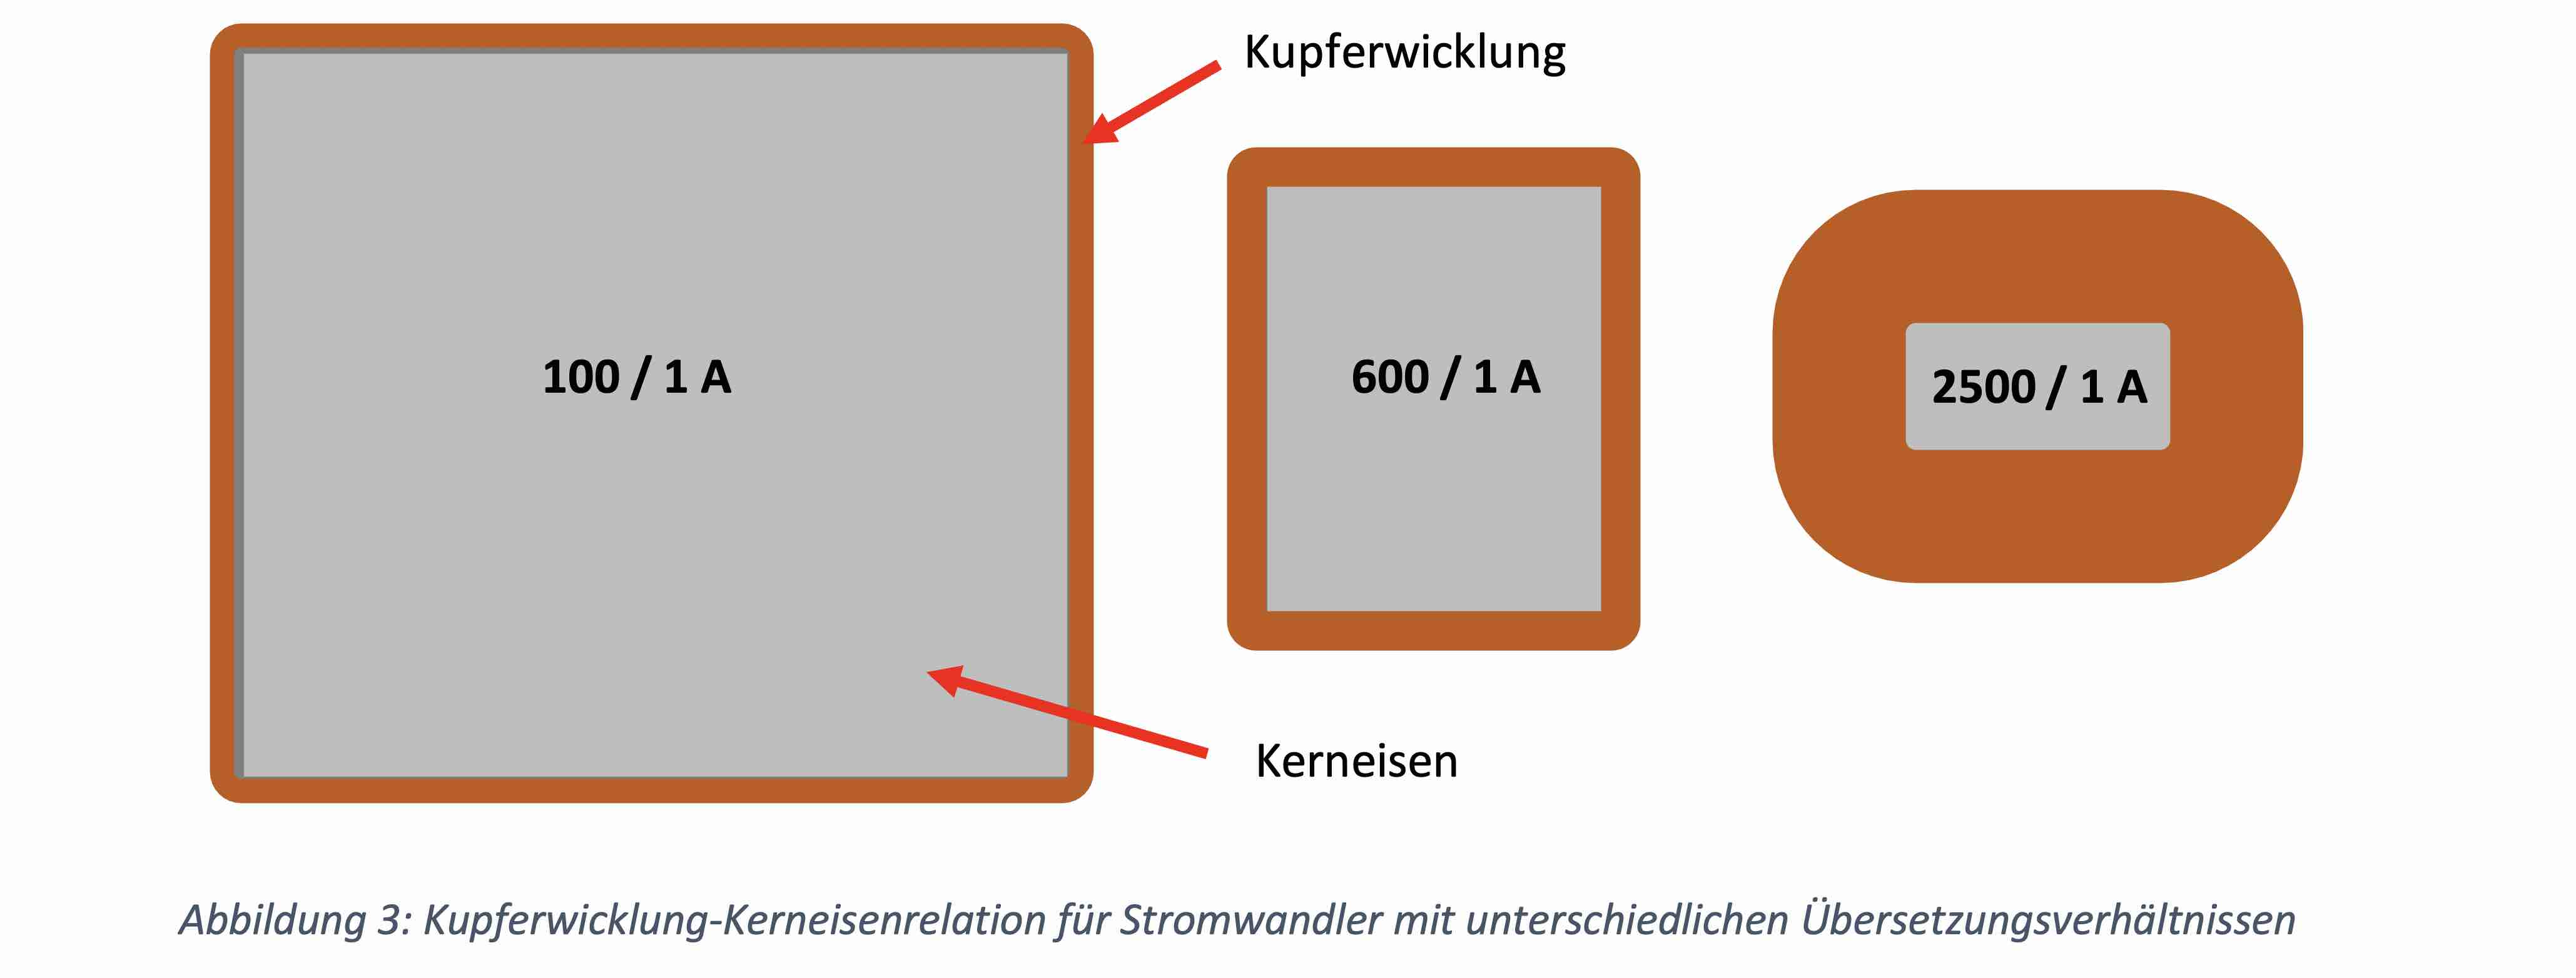 Stromwandler, MBS, MBS AG, Funktion Stromwandler, Flussdichte, Magnetischer Fluss, Schutztechnik, Alexander Muth